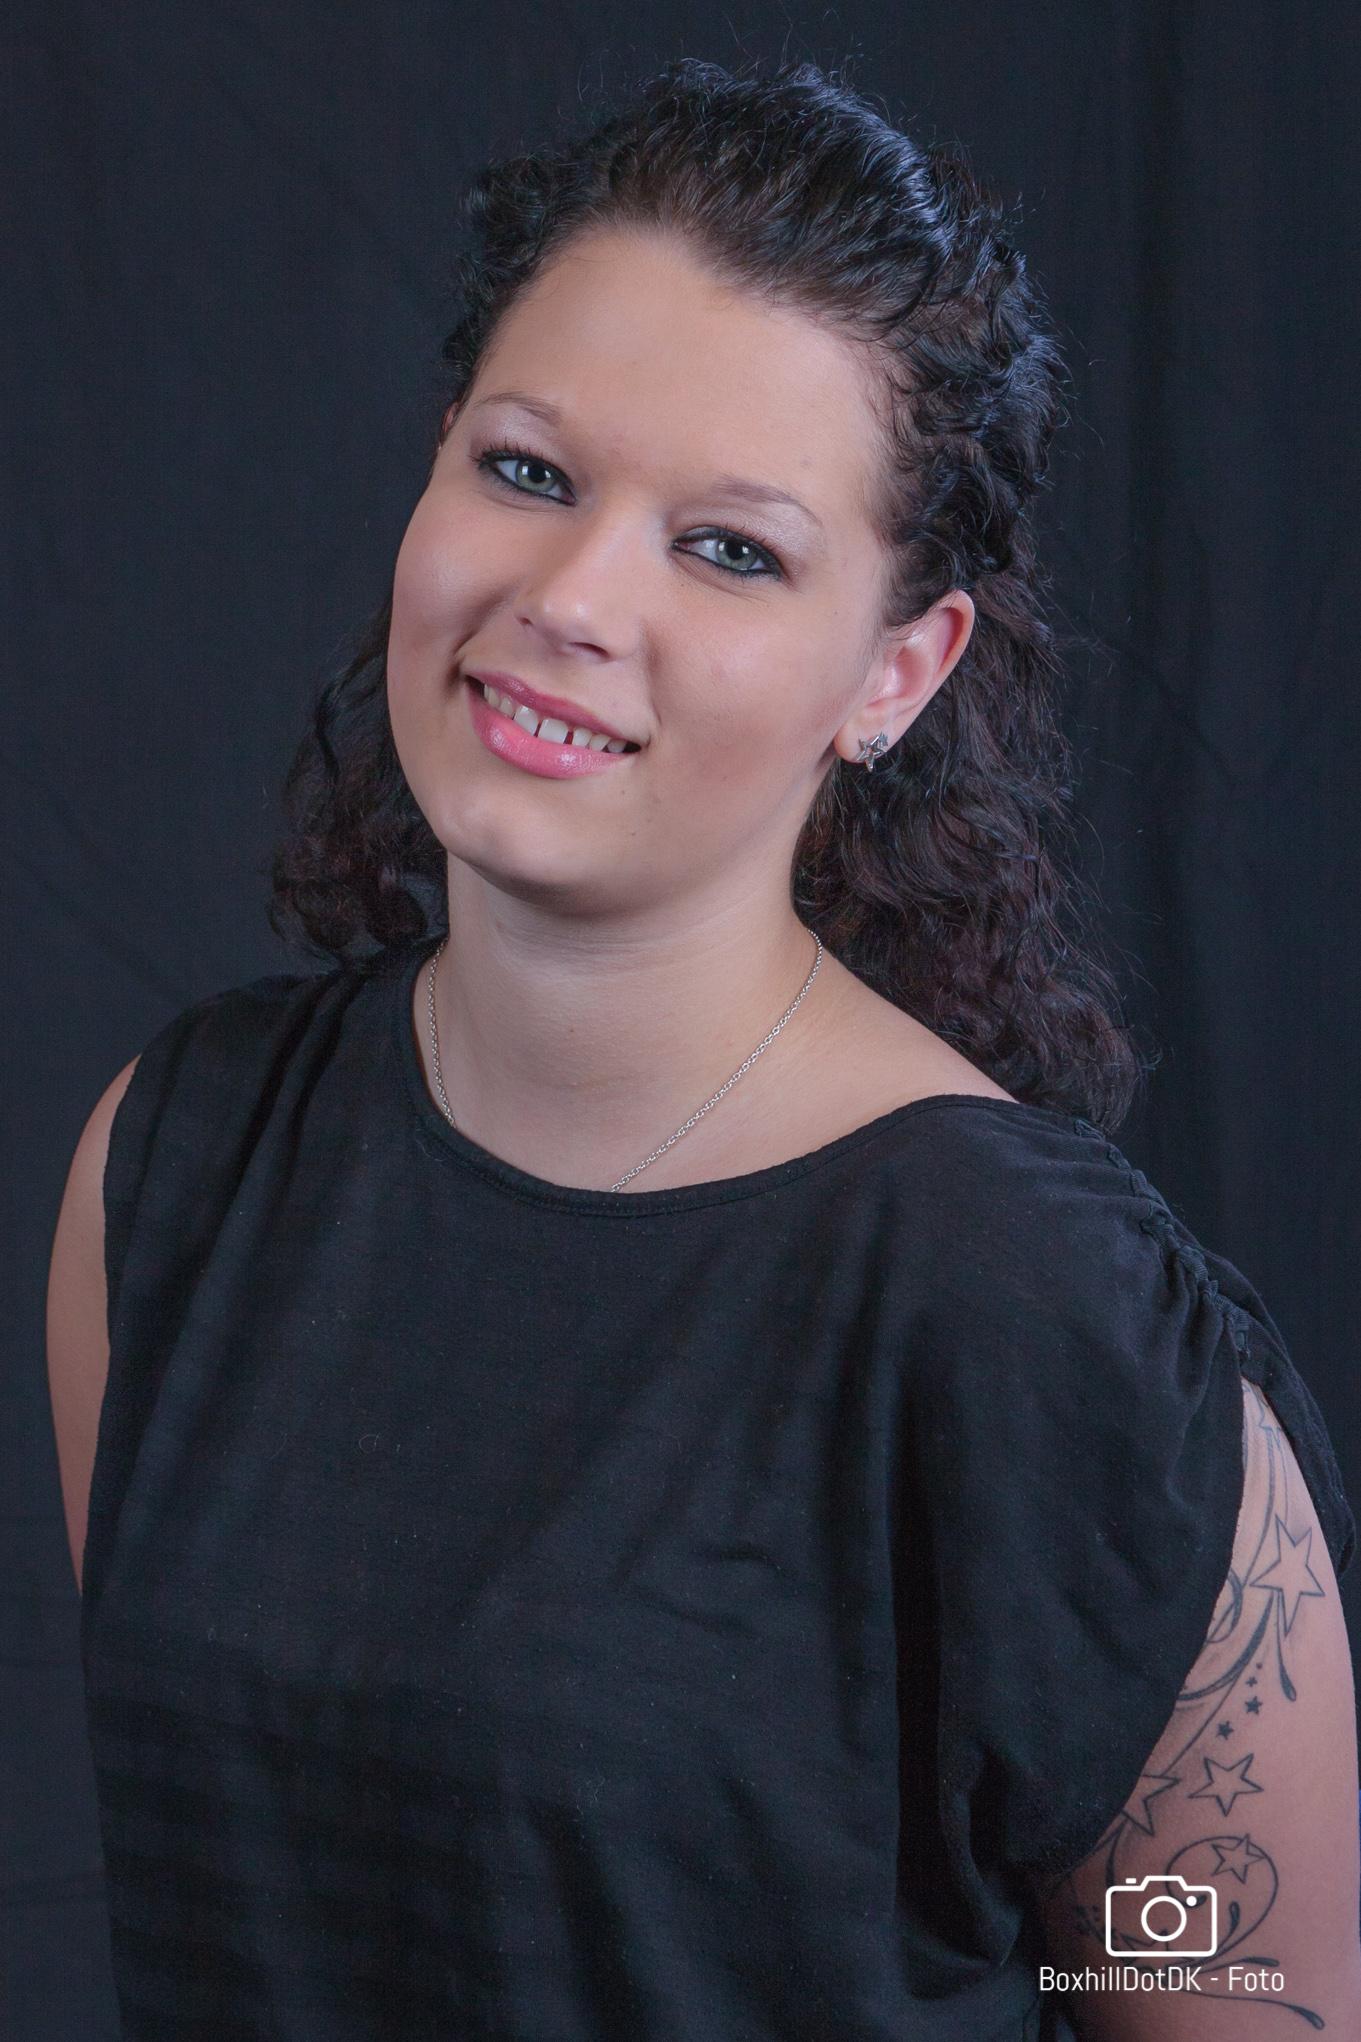 Rikke Klamer Jørgensen-001_MG_9778_R_W